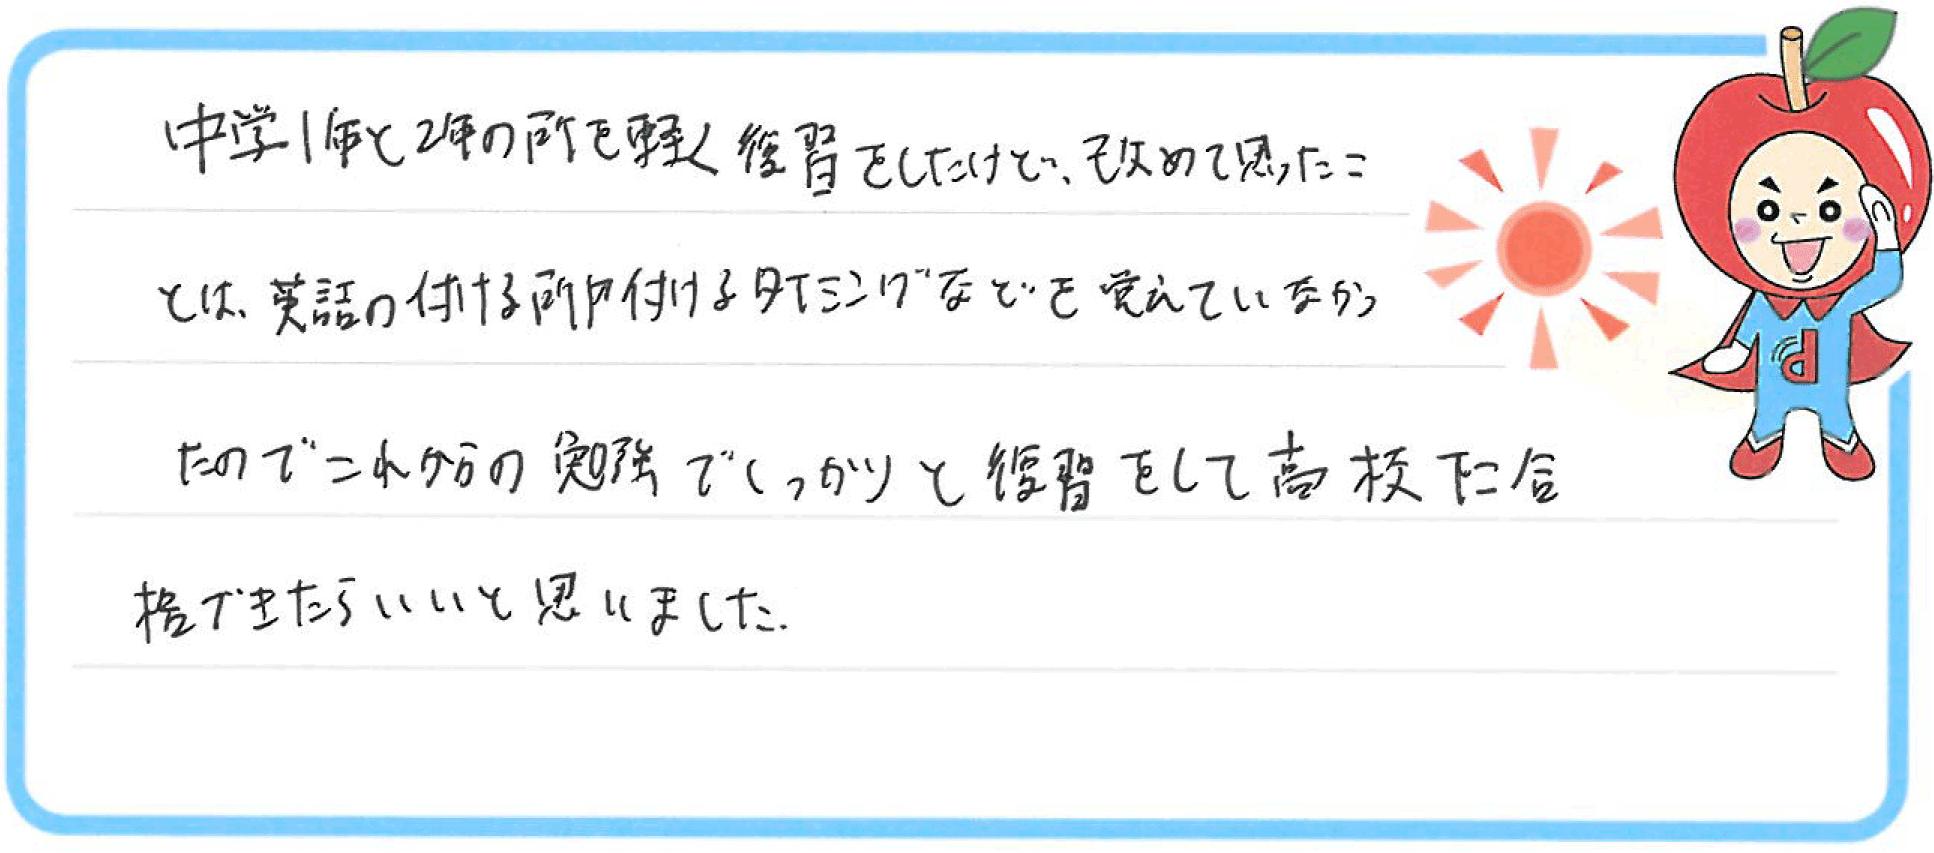 S君(勝山市)からの口コミ